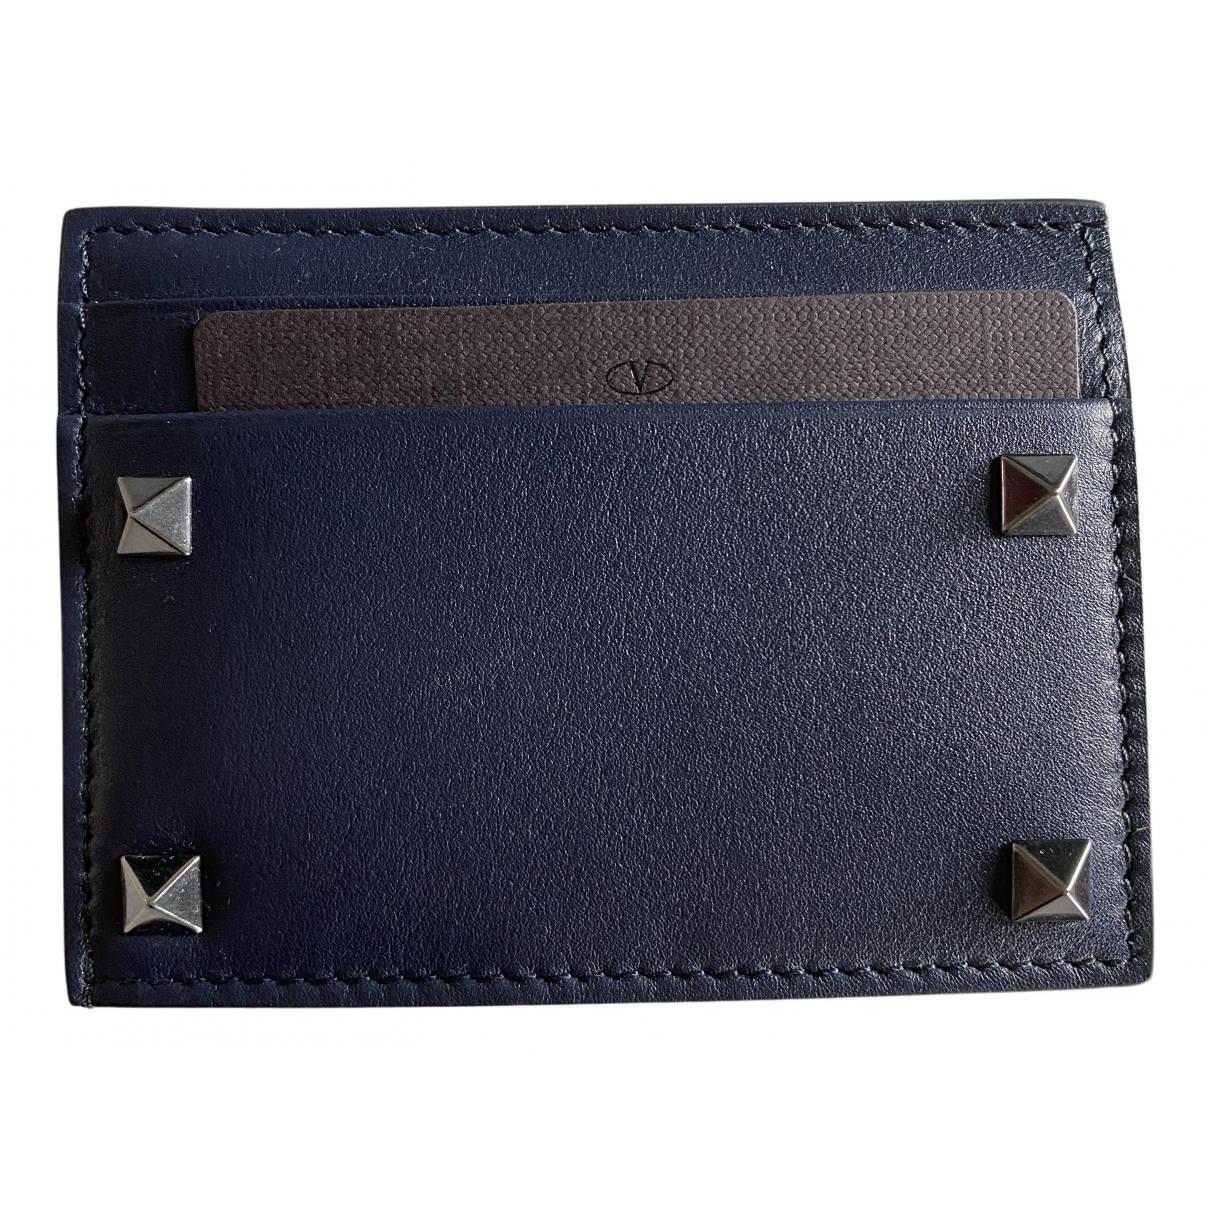 Valentino Garavani N Blue Leather Small bag, wallet & cases for Men N